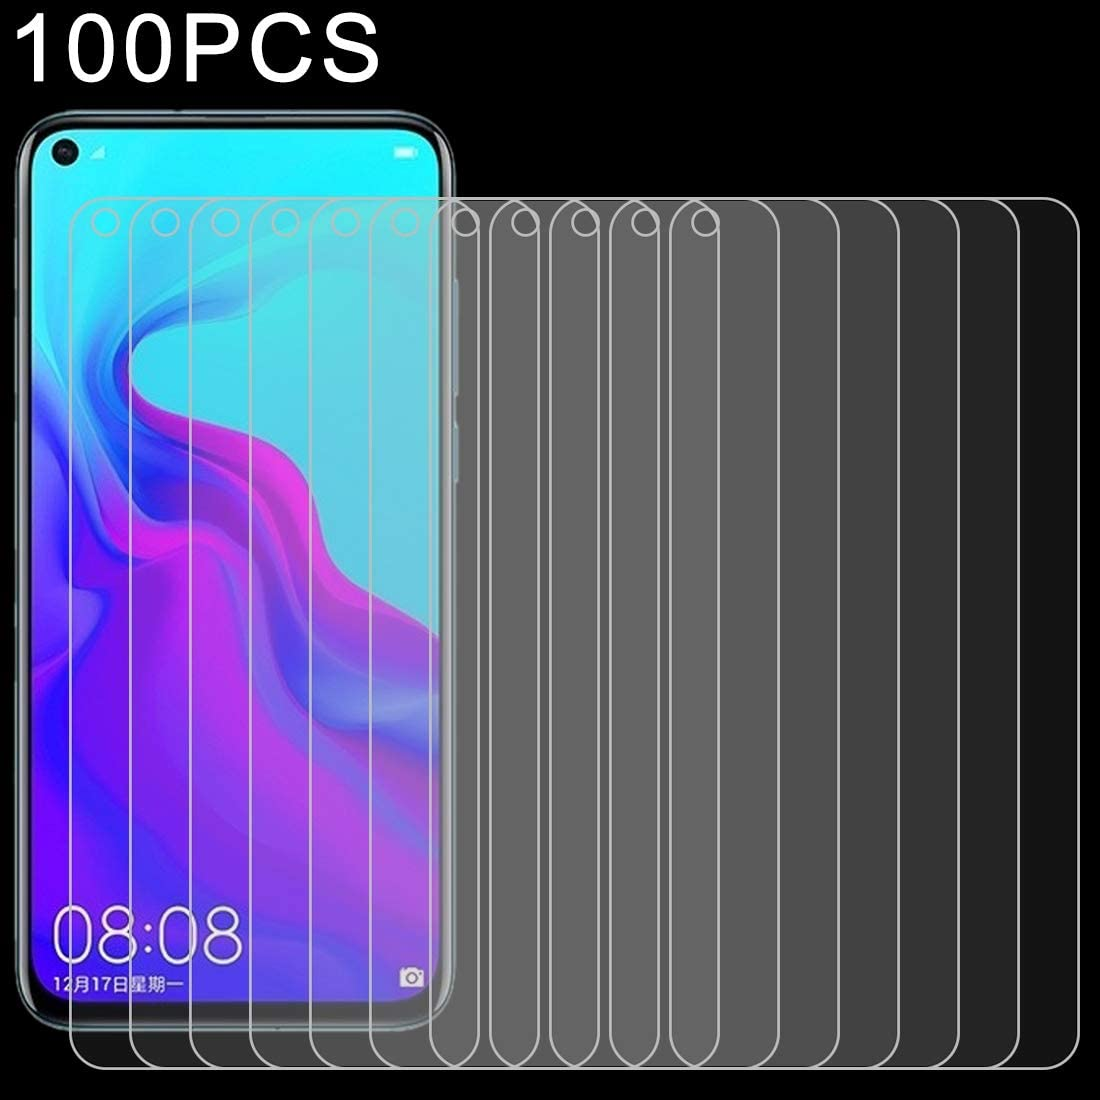 ALICEWU WJH 100 PCS 0.26mm 9H 2.5D Explosion-Proof Tempered Glass Film for Huawei Nova 4